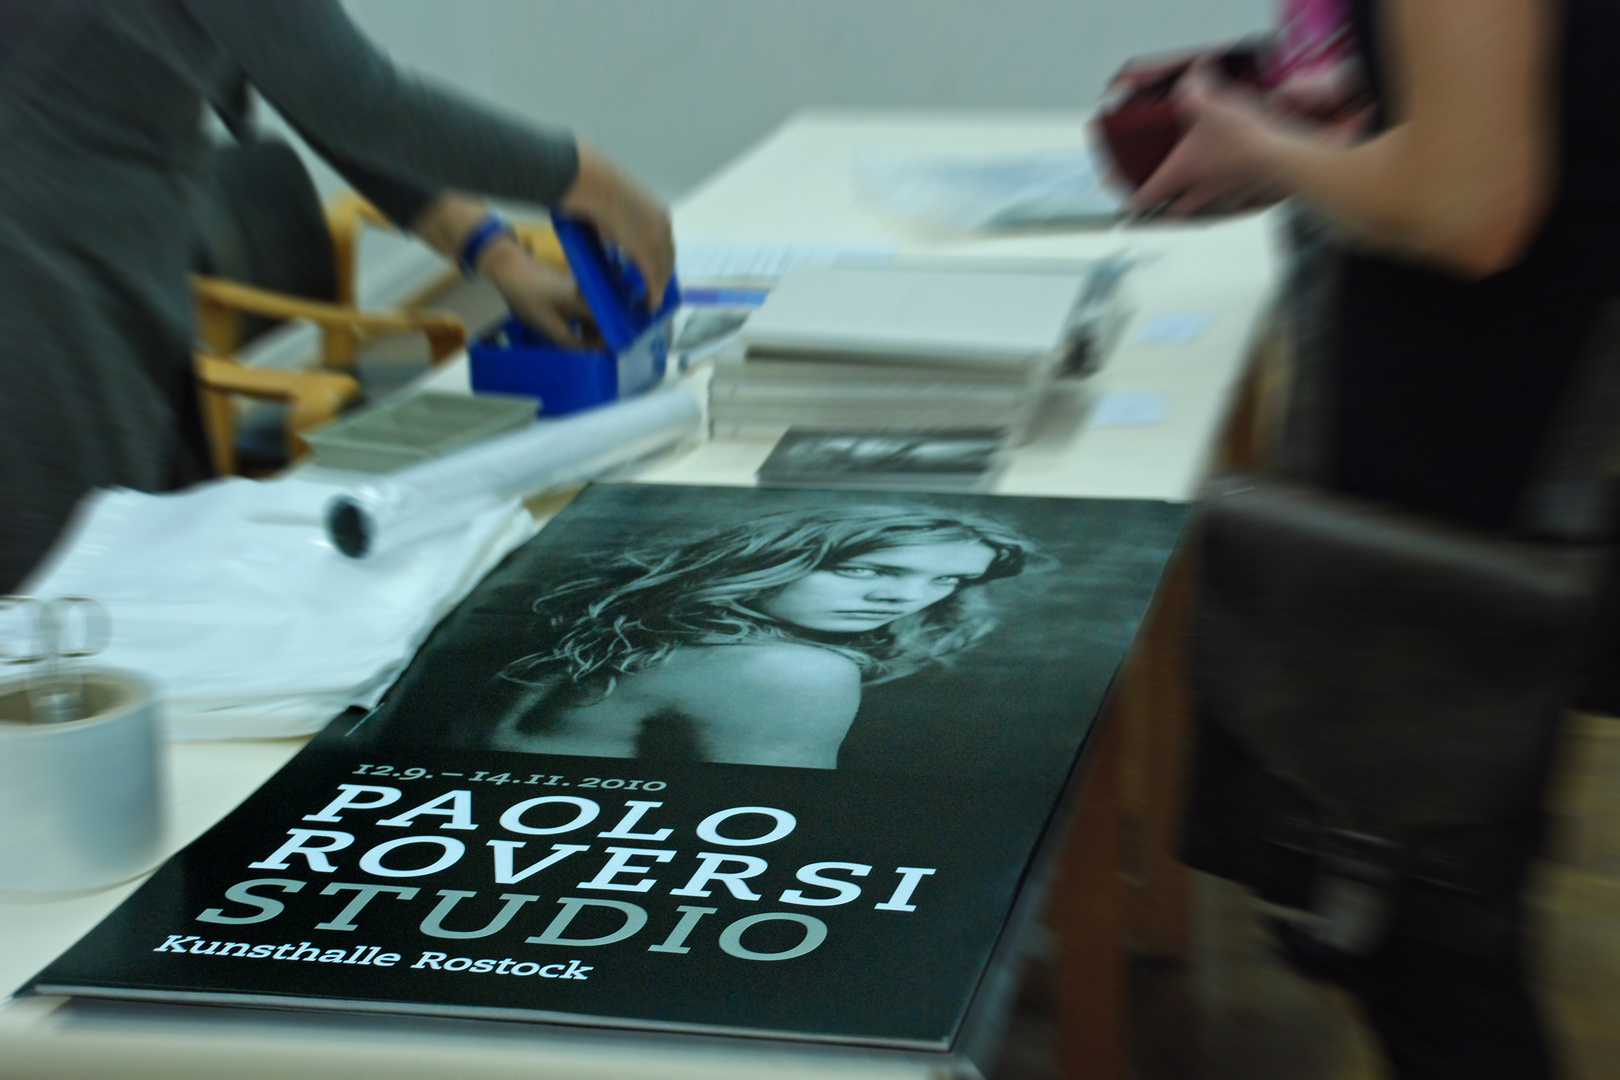 Vernissage mit Paolo Roversi